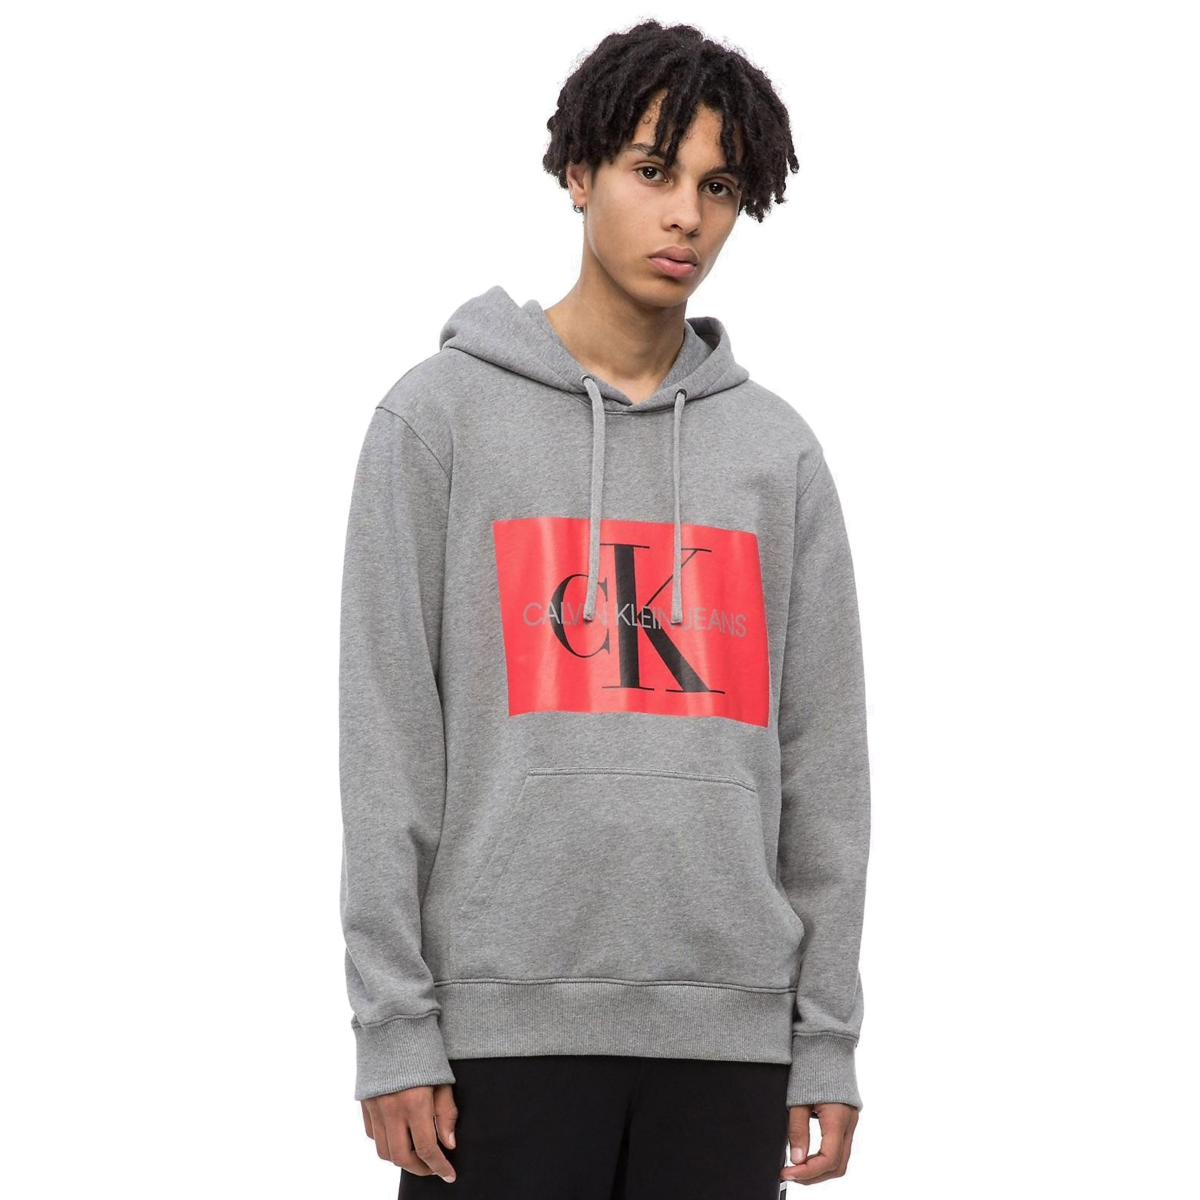 Felpa con cappuccio e logo Calvin Klein Jeans da uomo rif. J30J307745